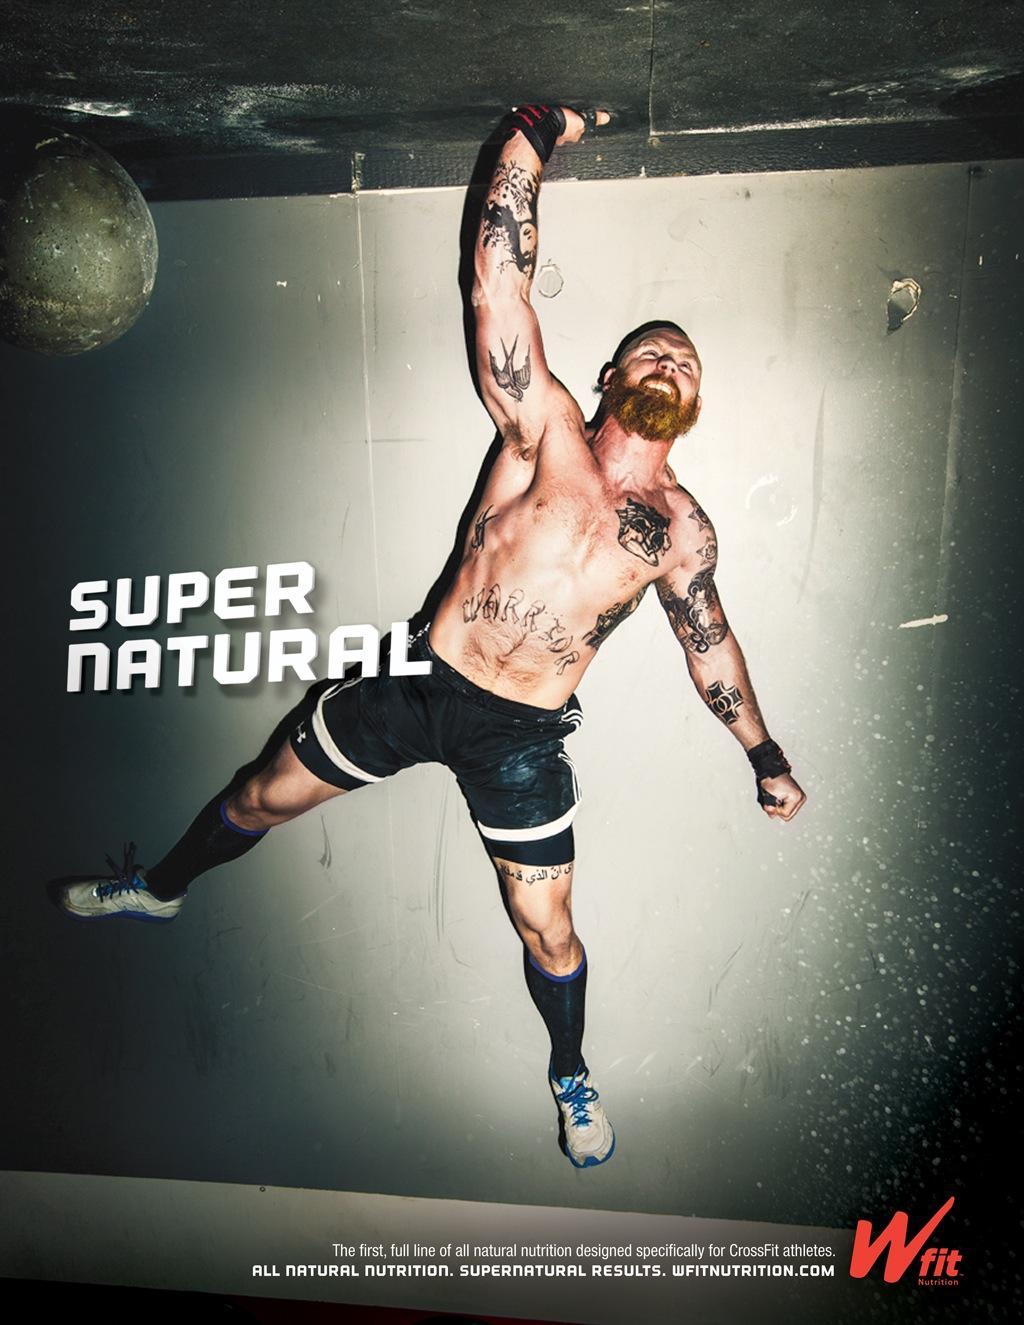 Wfit Nutrition Print Ad -  Super Natural, 7